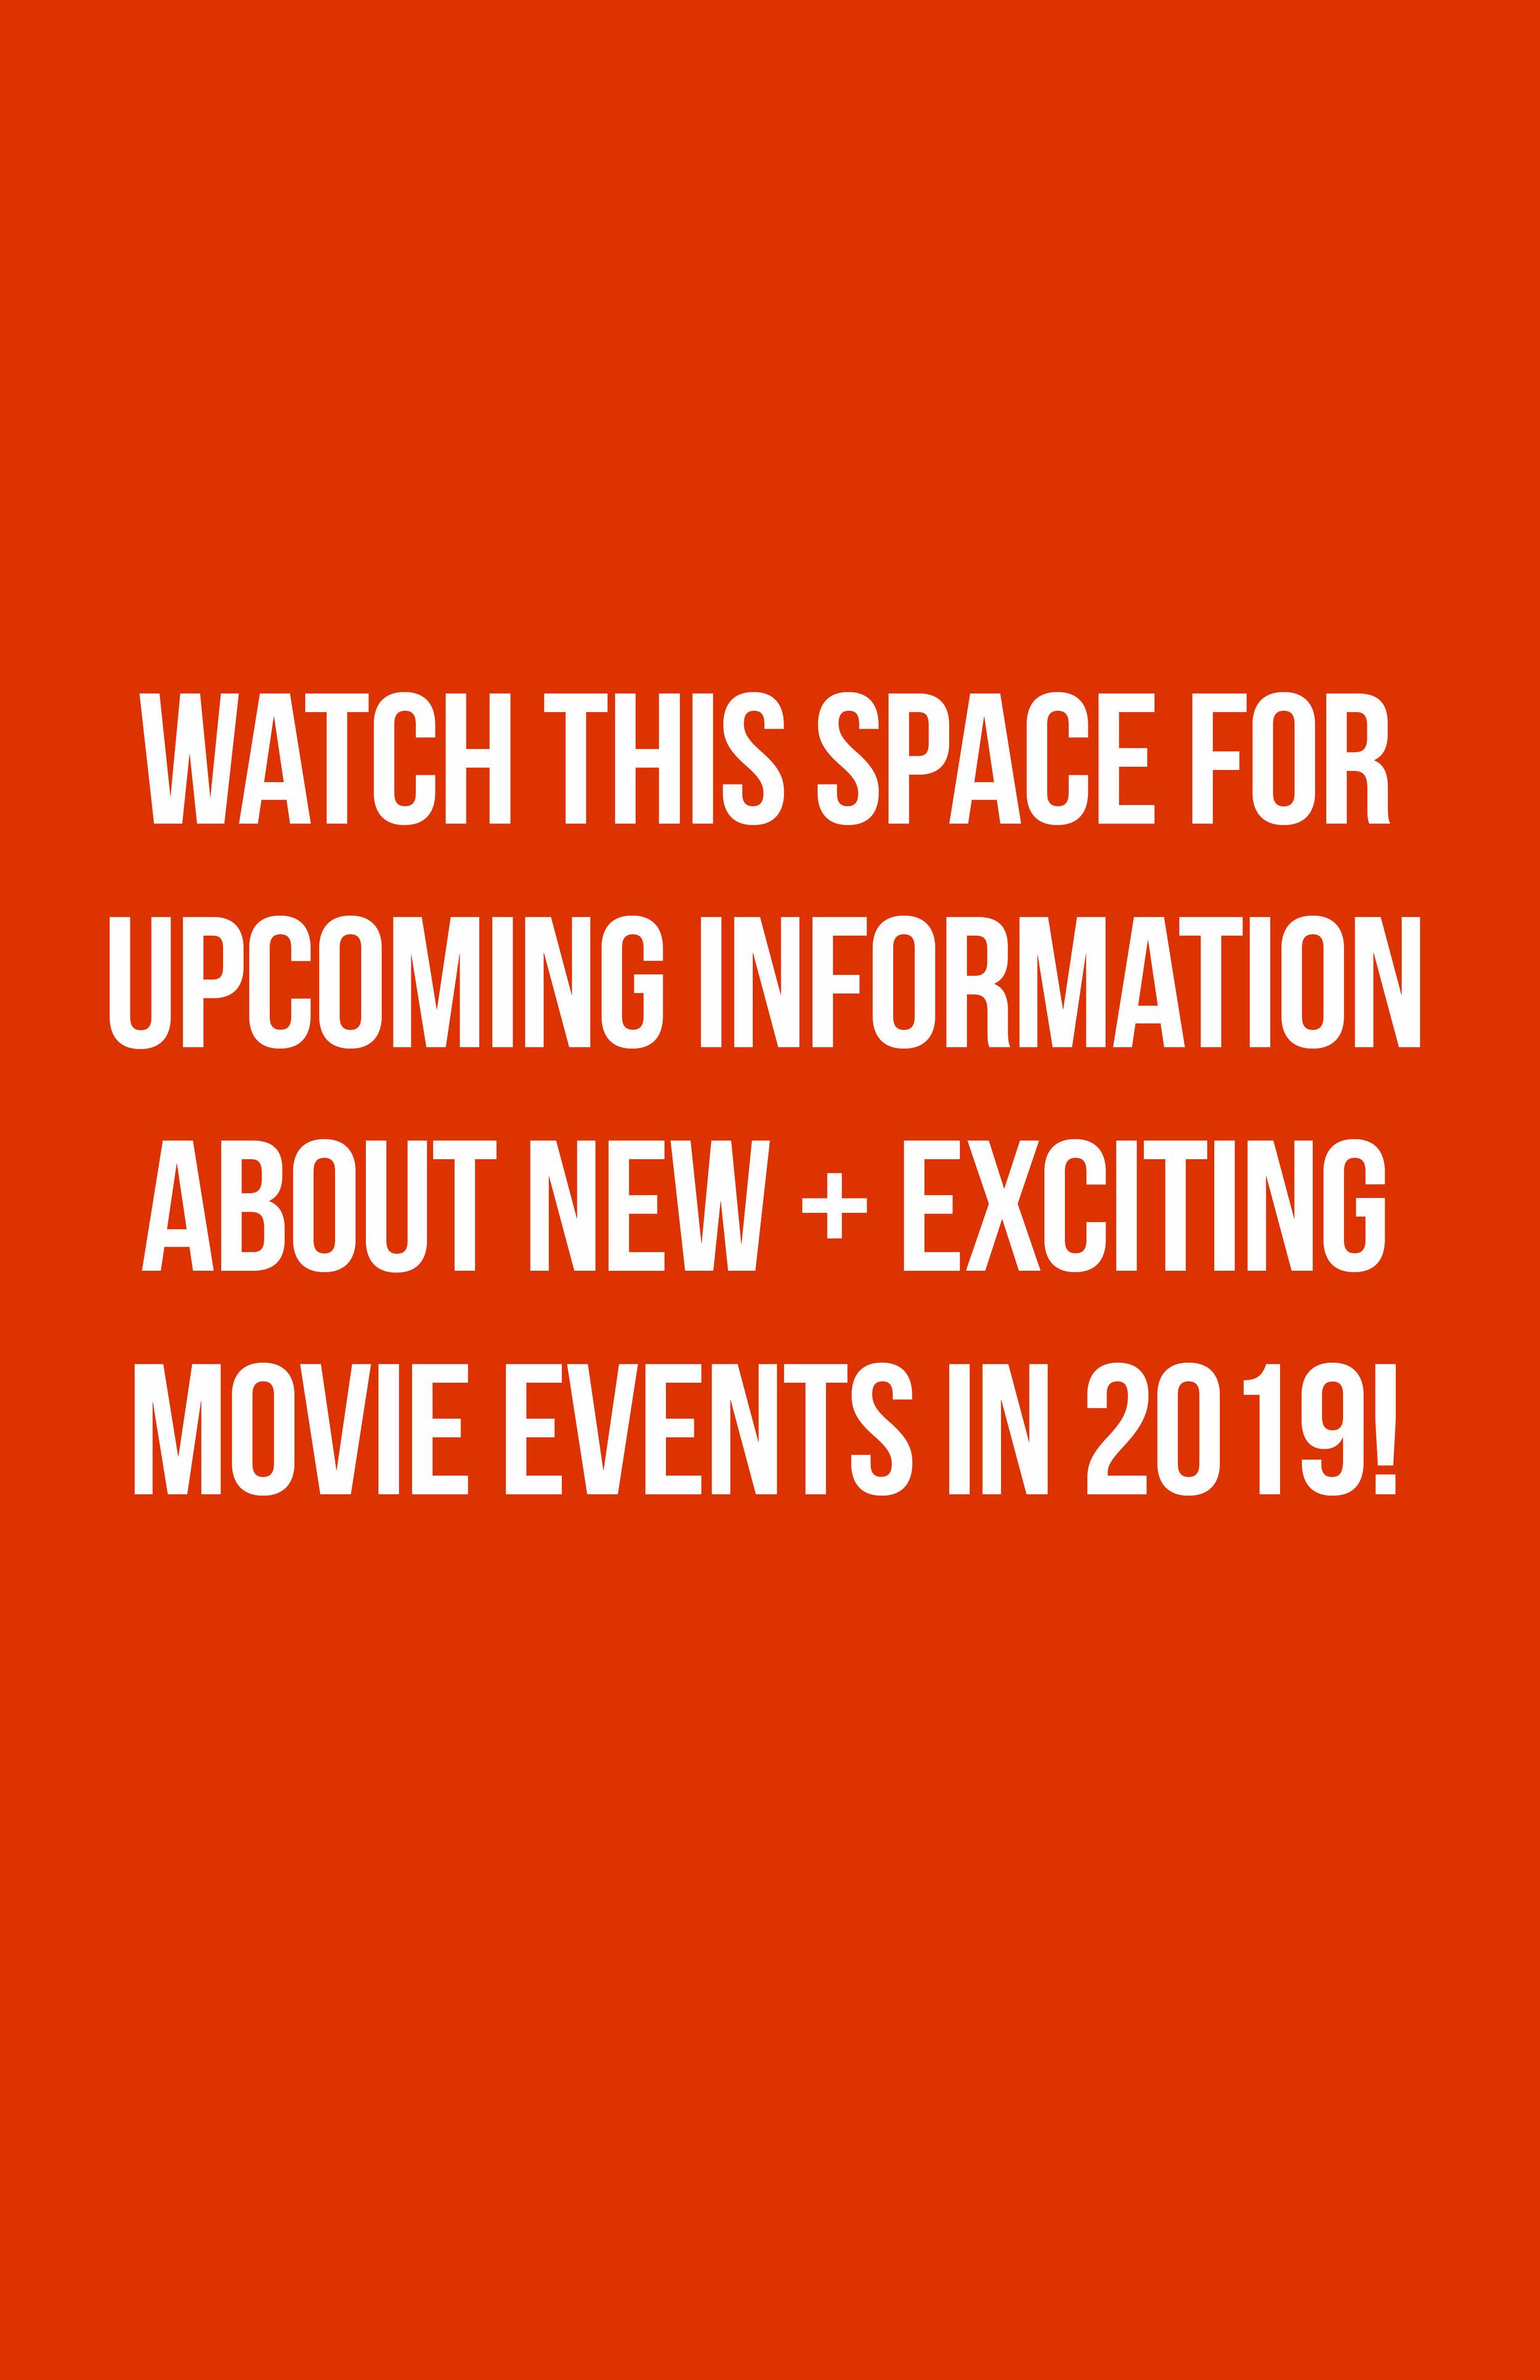 2019_Movie_Event_Web_Placeholder.jpg